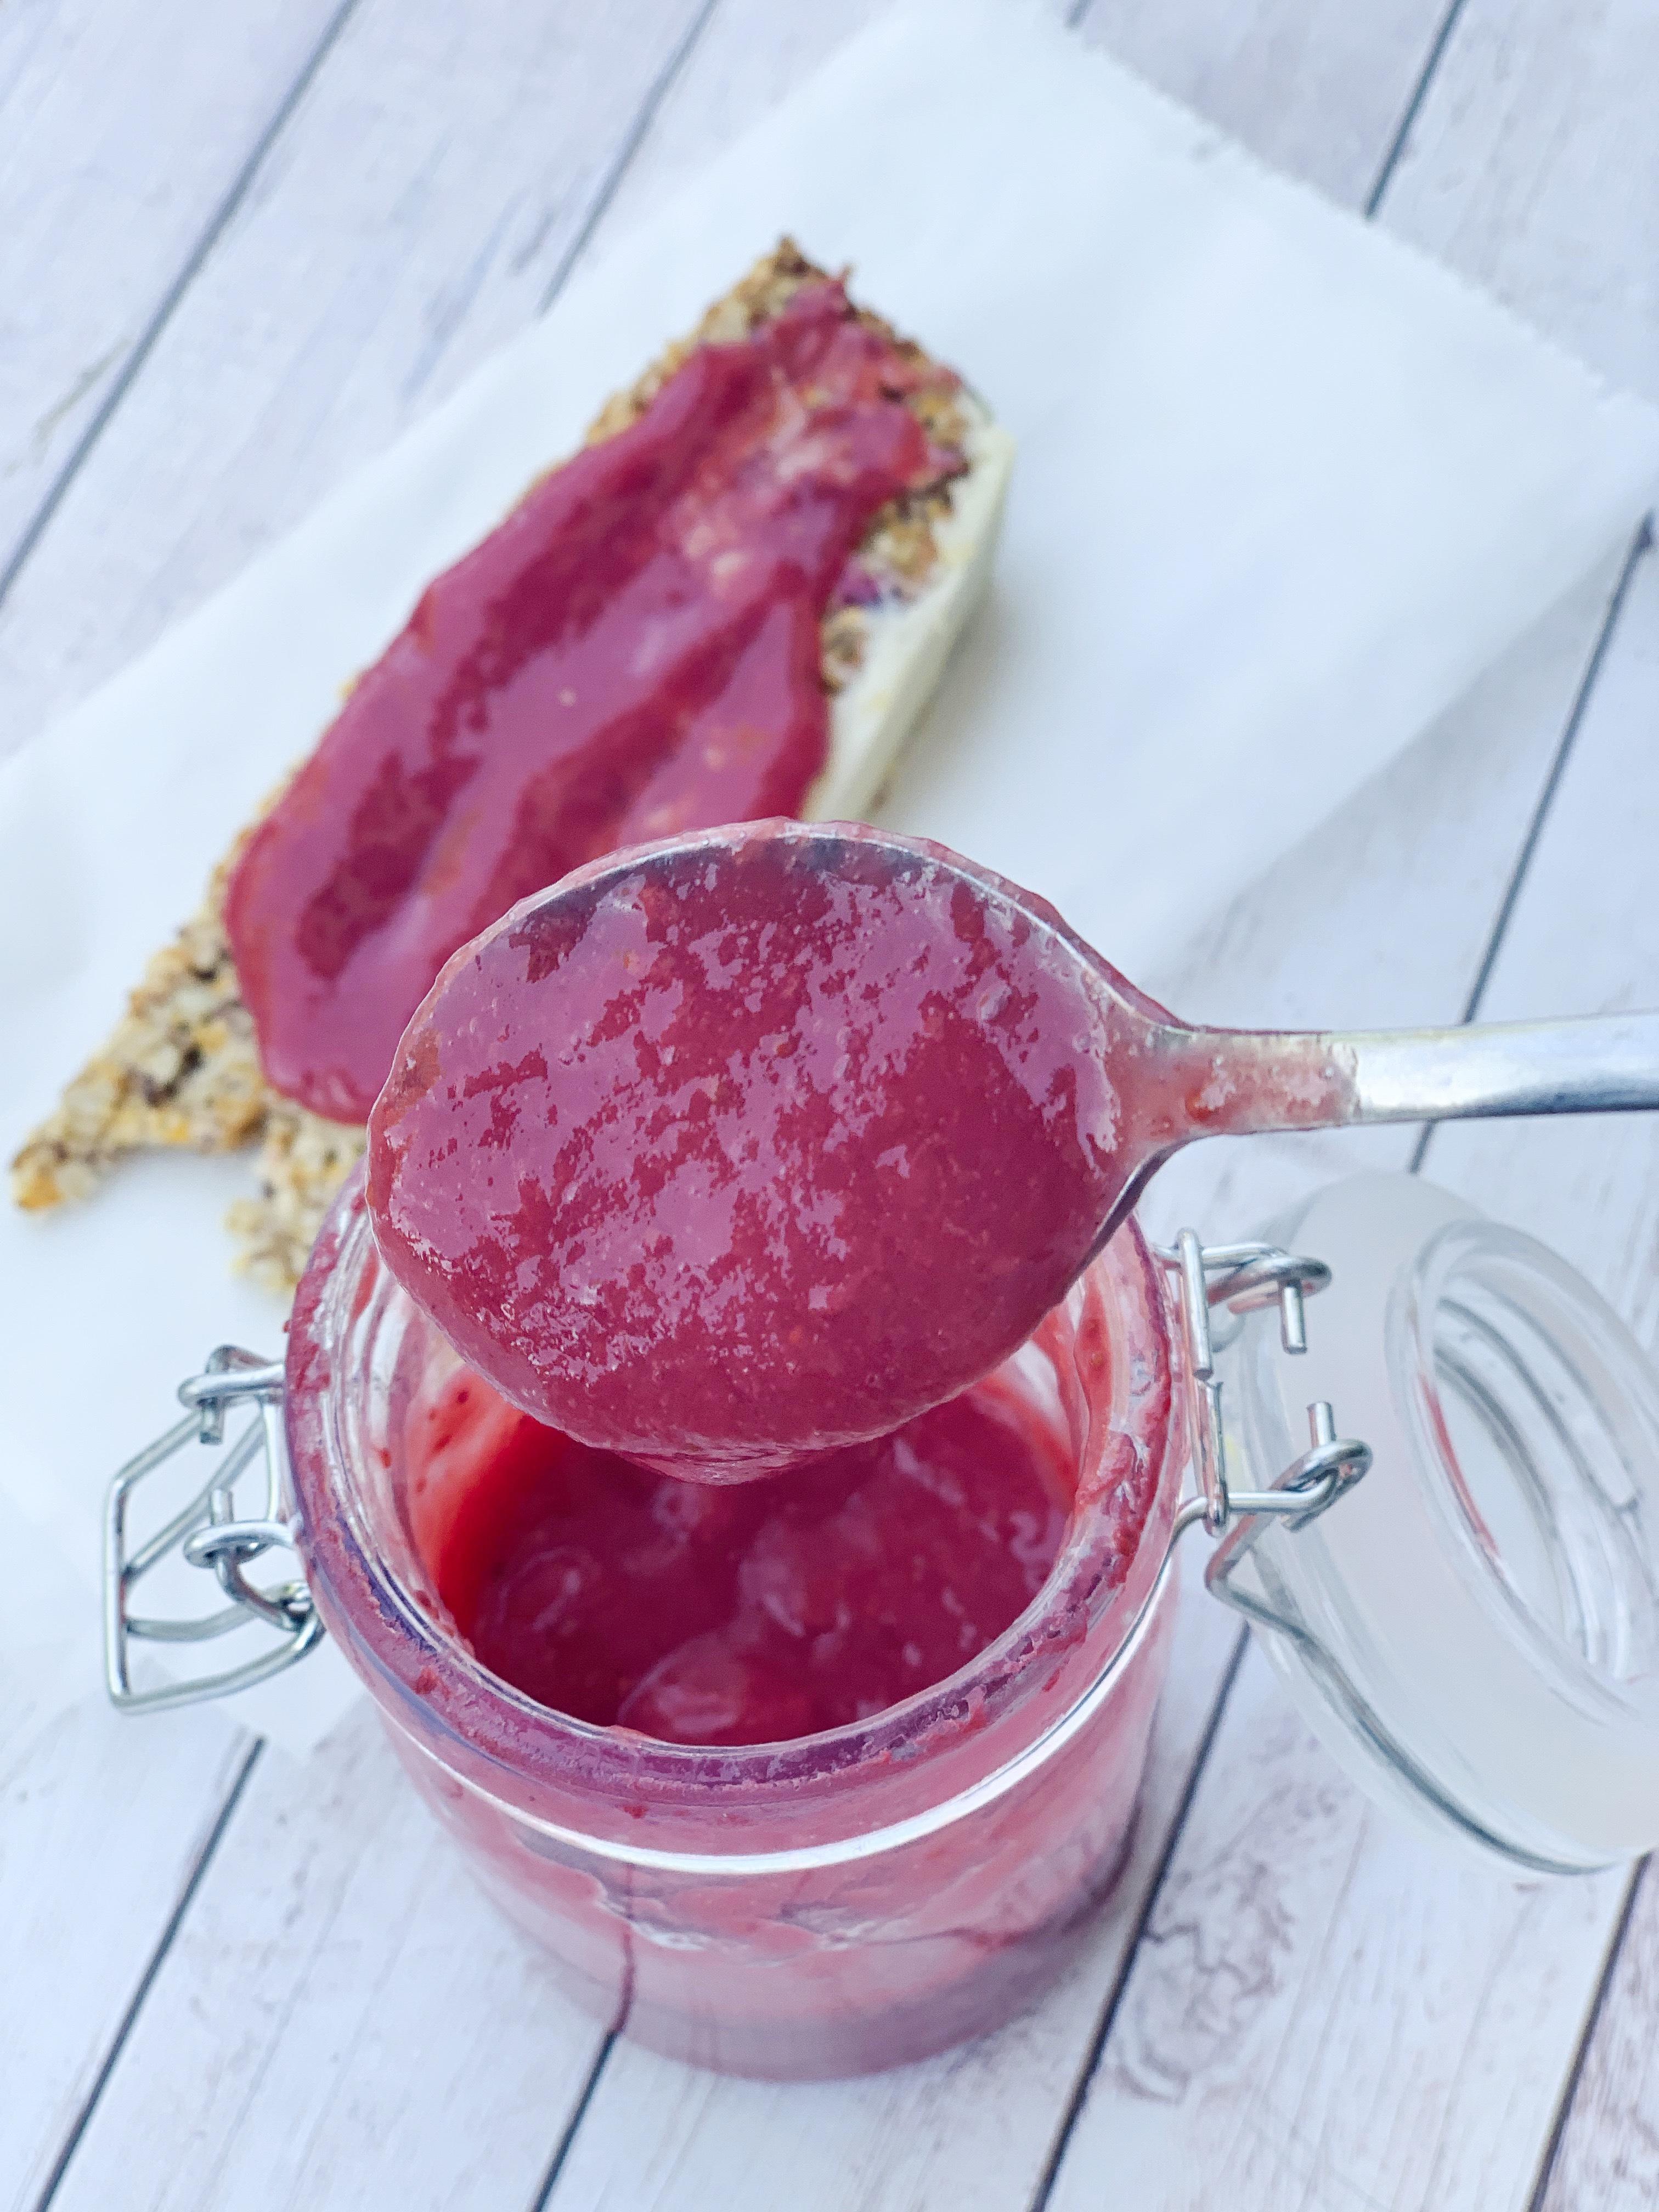 Strawberry keto jam in a jar